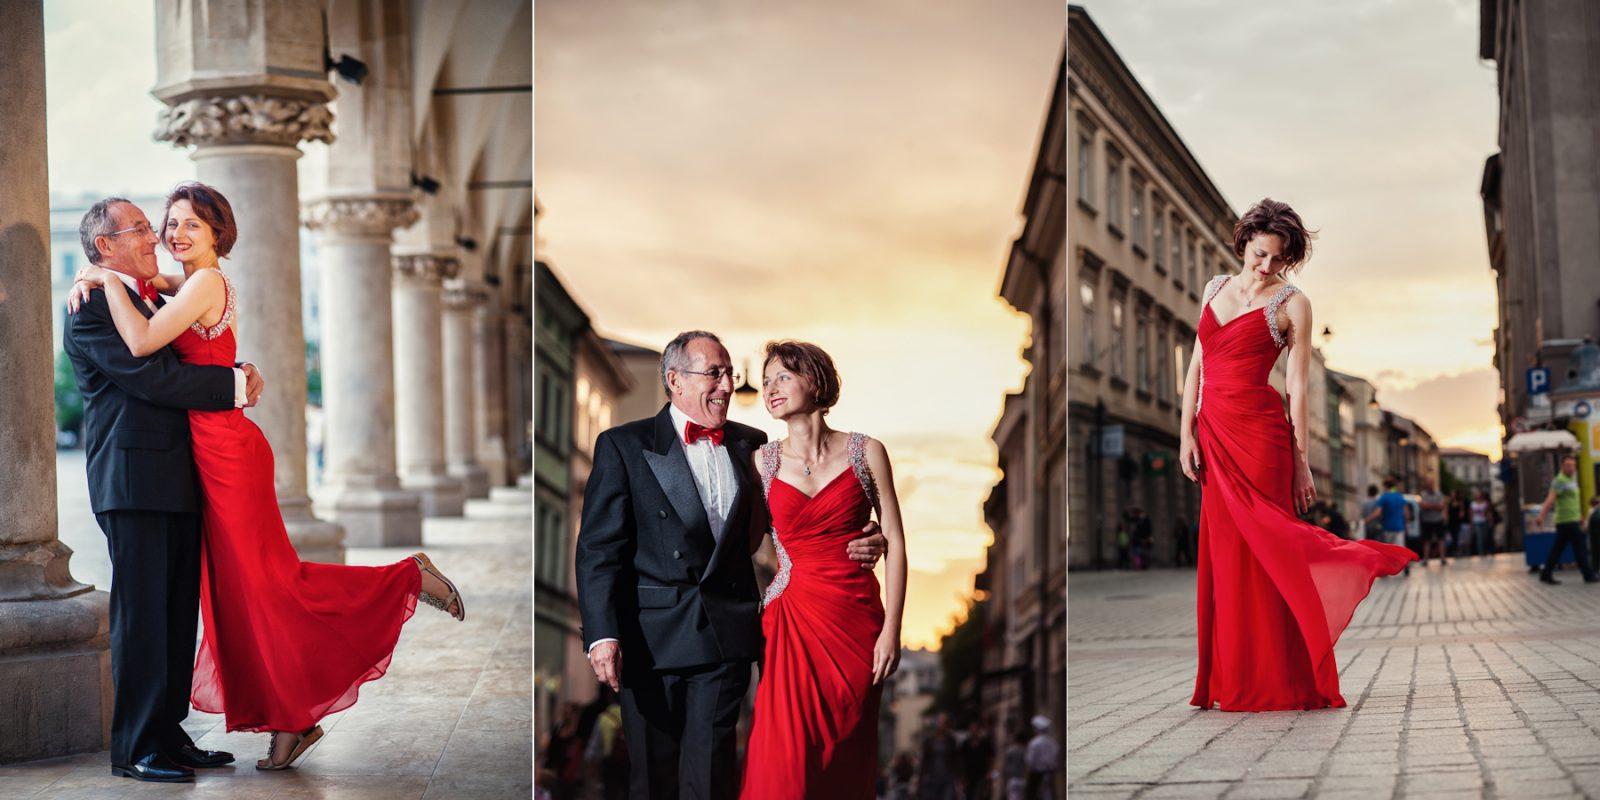 sklejka - Monica and John anniversary session/ wedding photographer